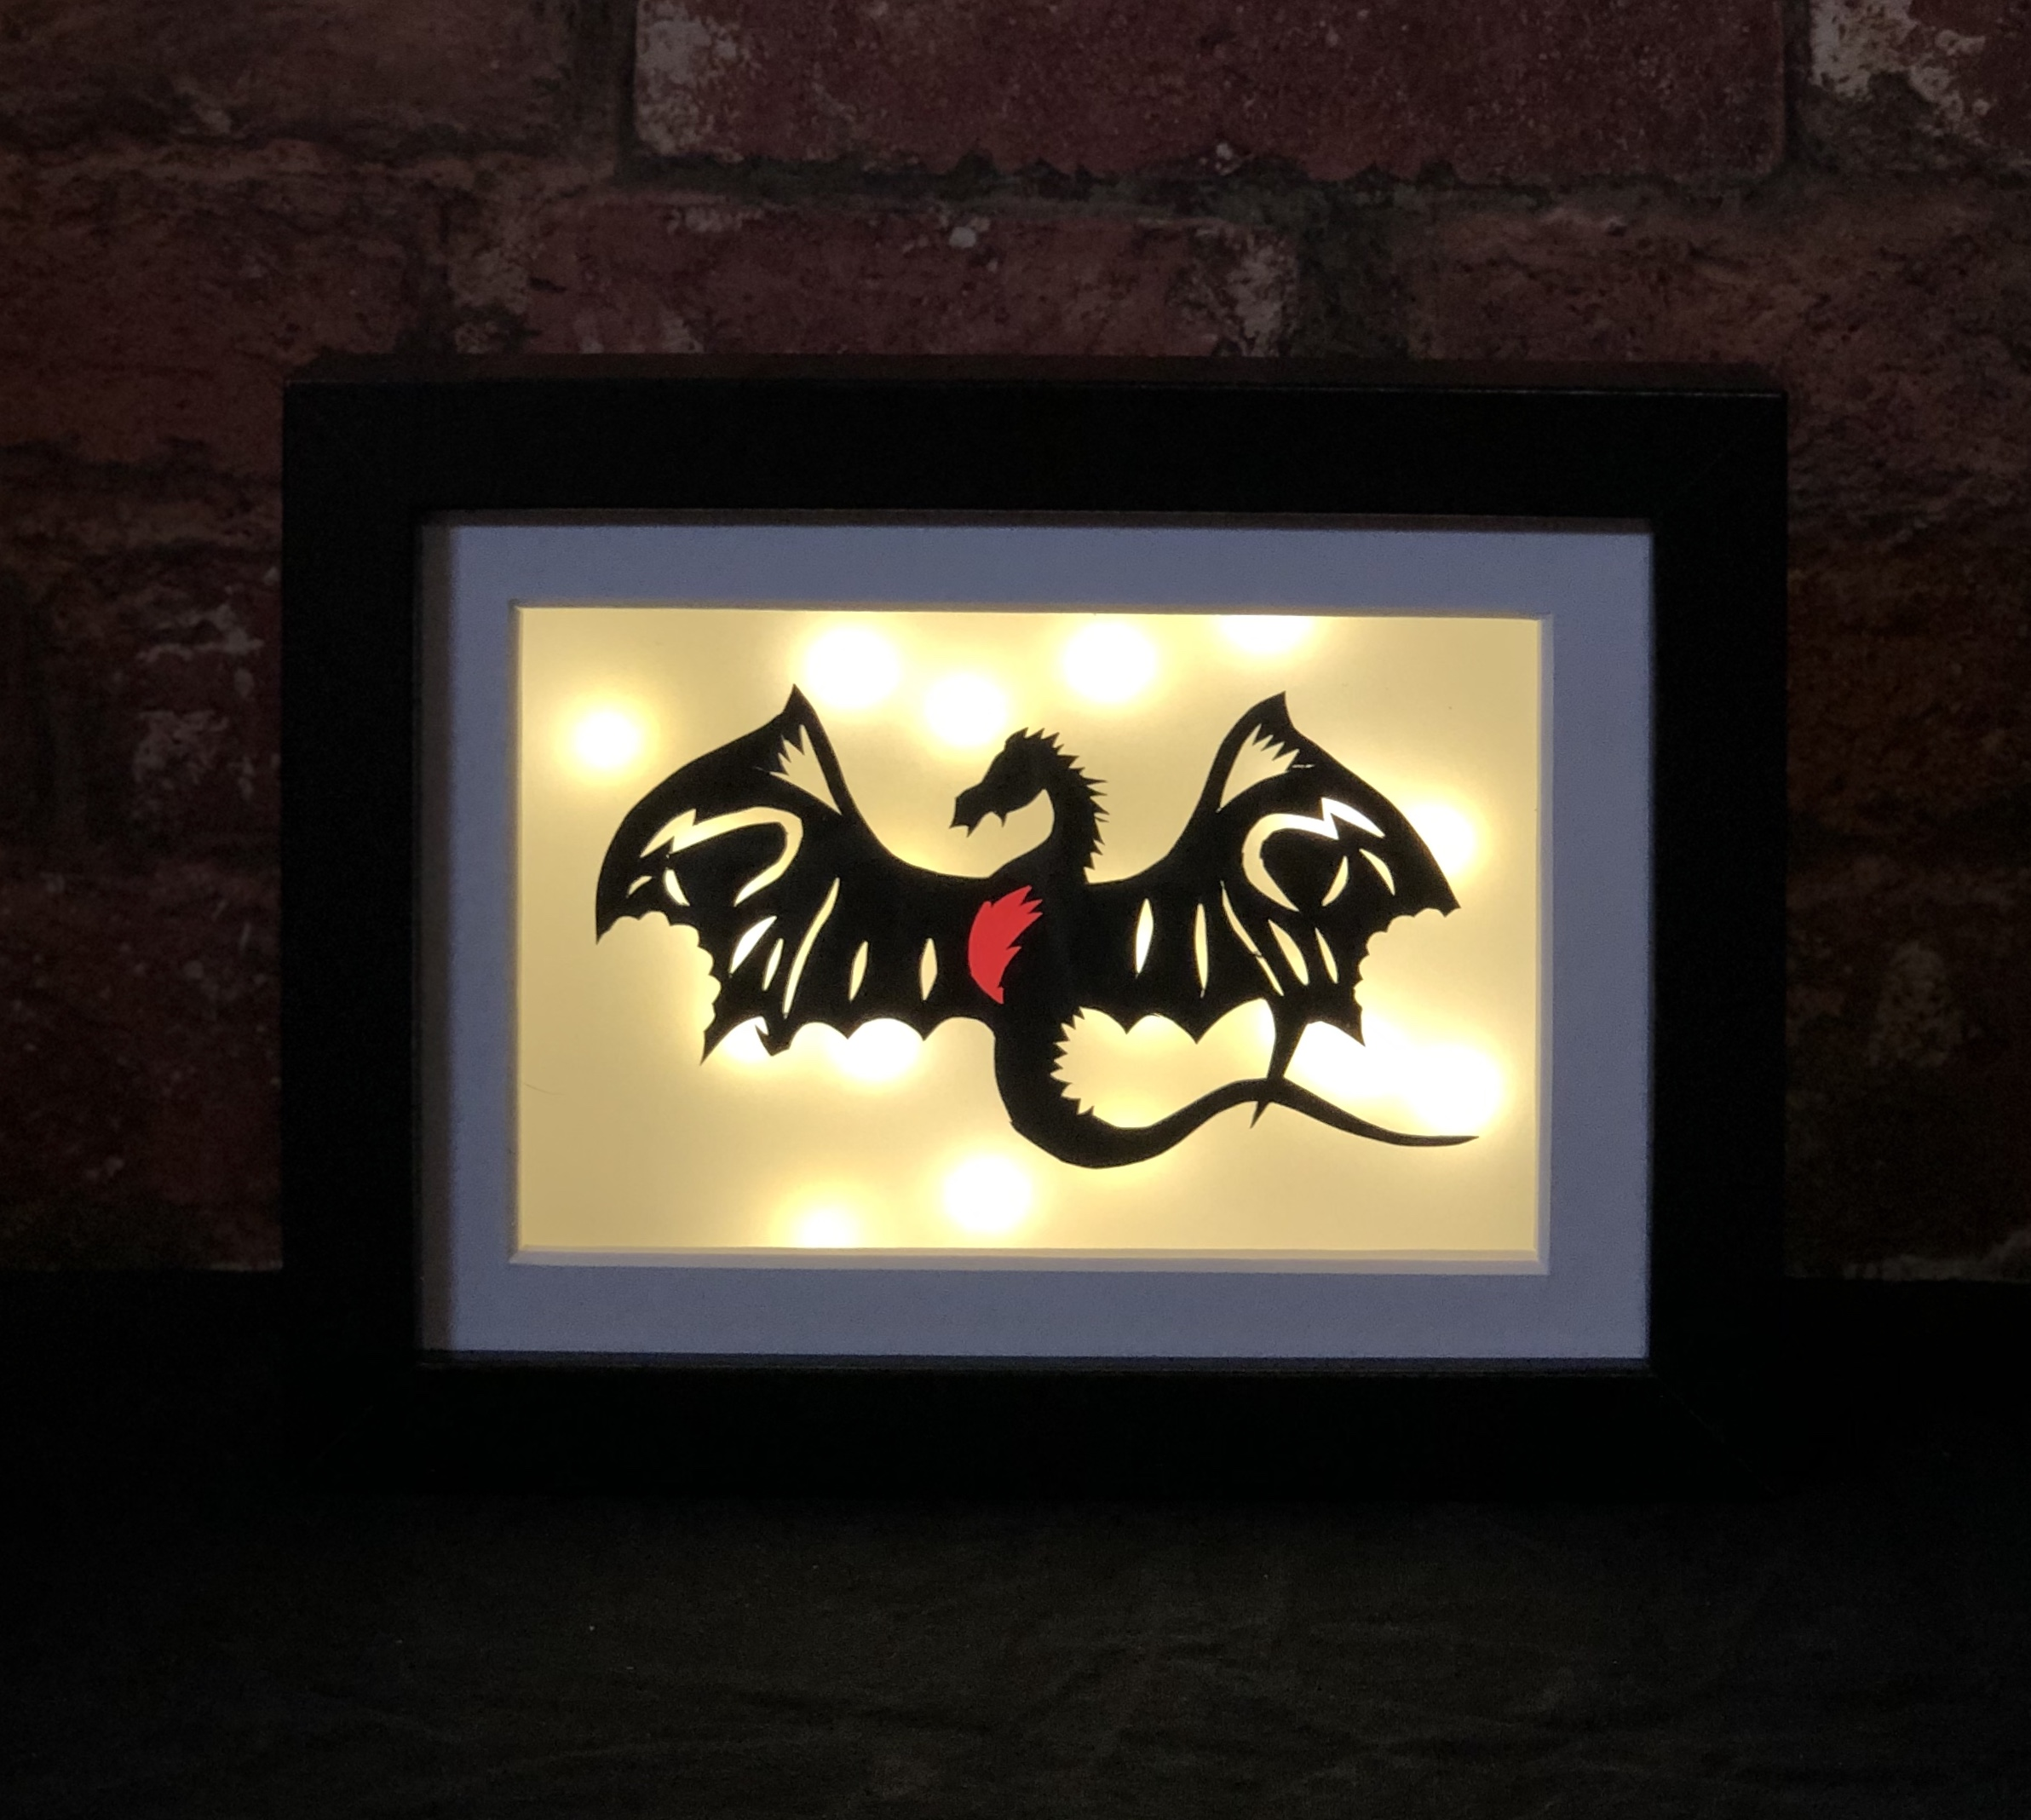 David Rudge Light Frame Designs